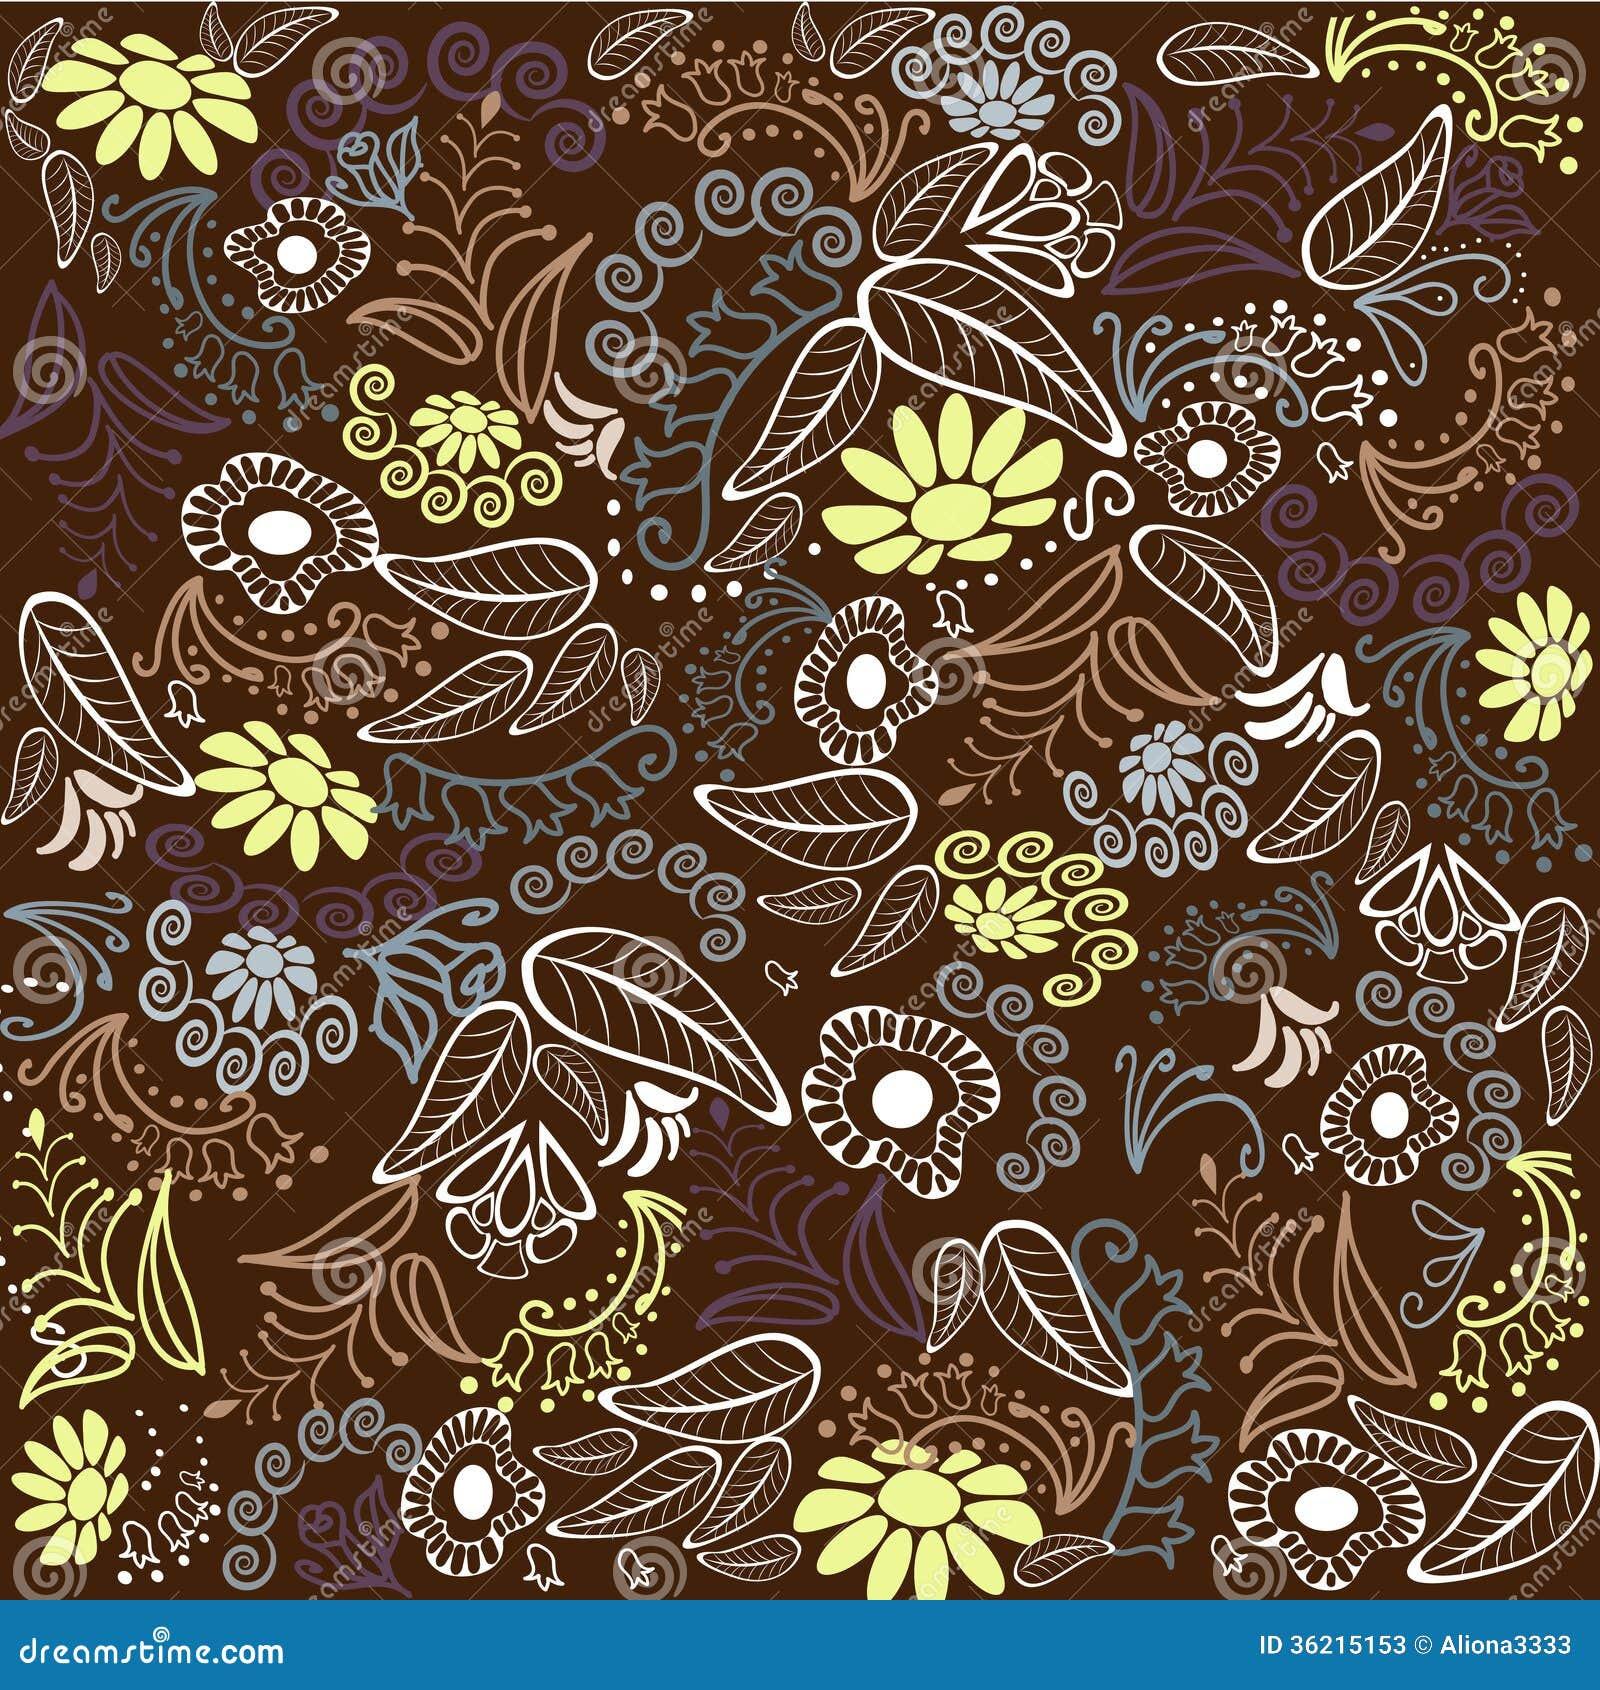 Brown Flower Pattern Stock Photos - Image: 36215153